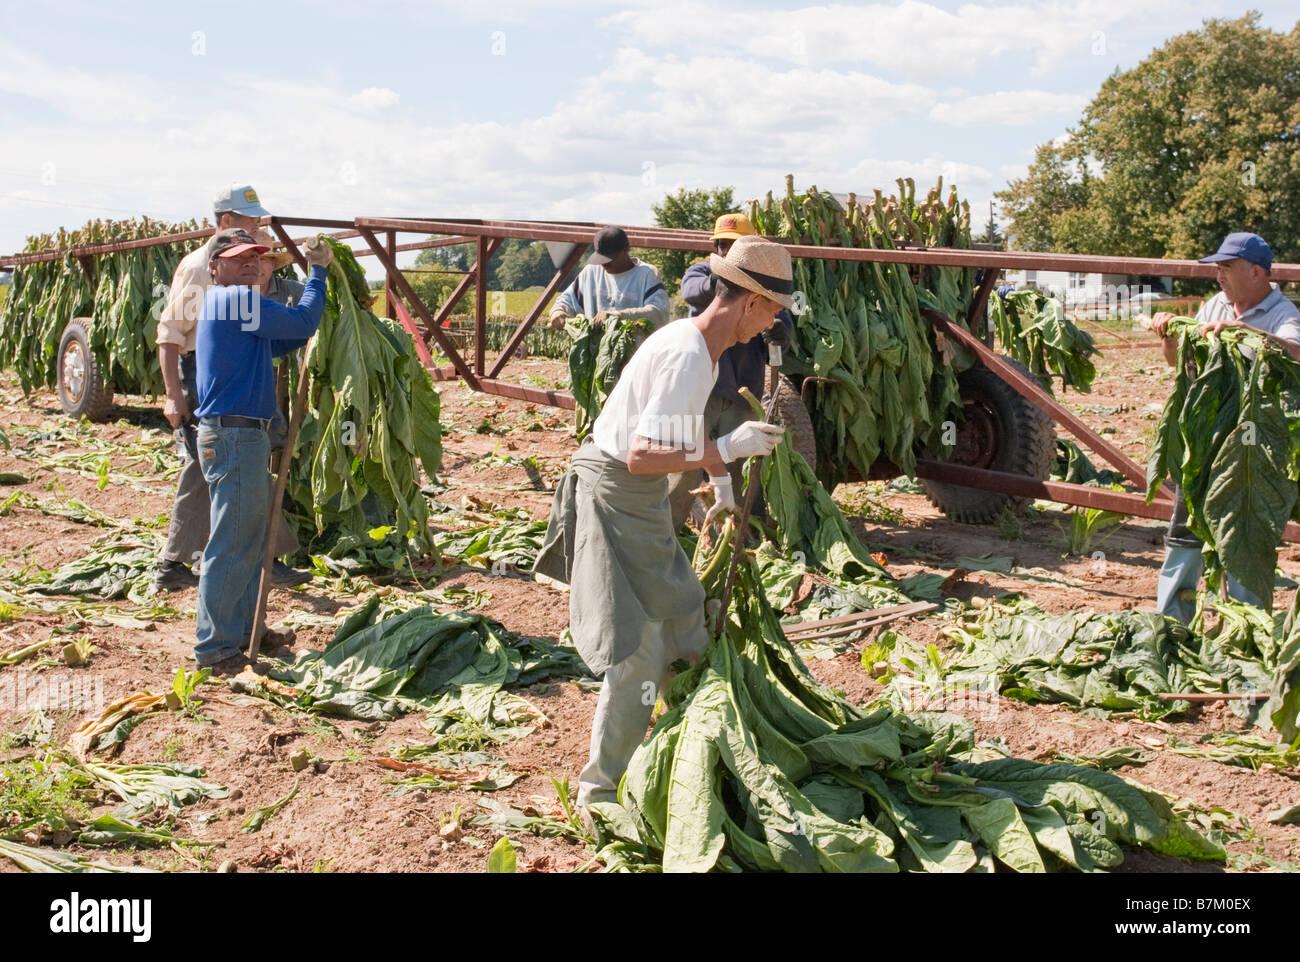 Tobacco farming in Ontario Canada - Stock Image